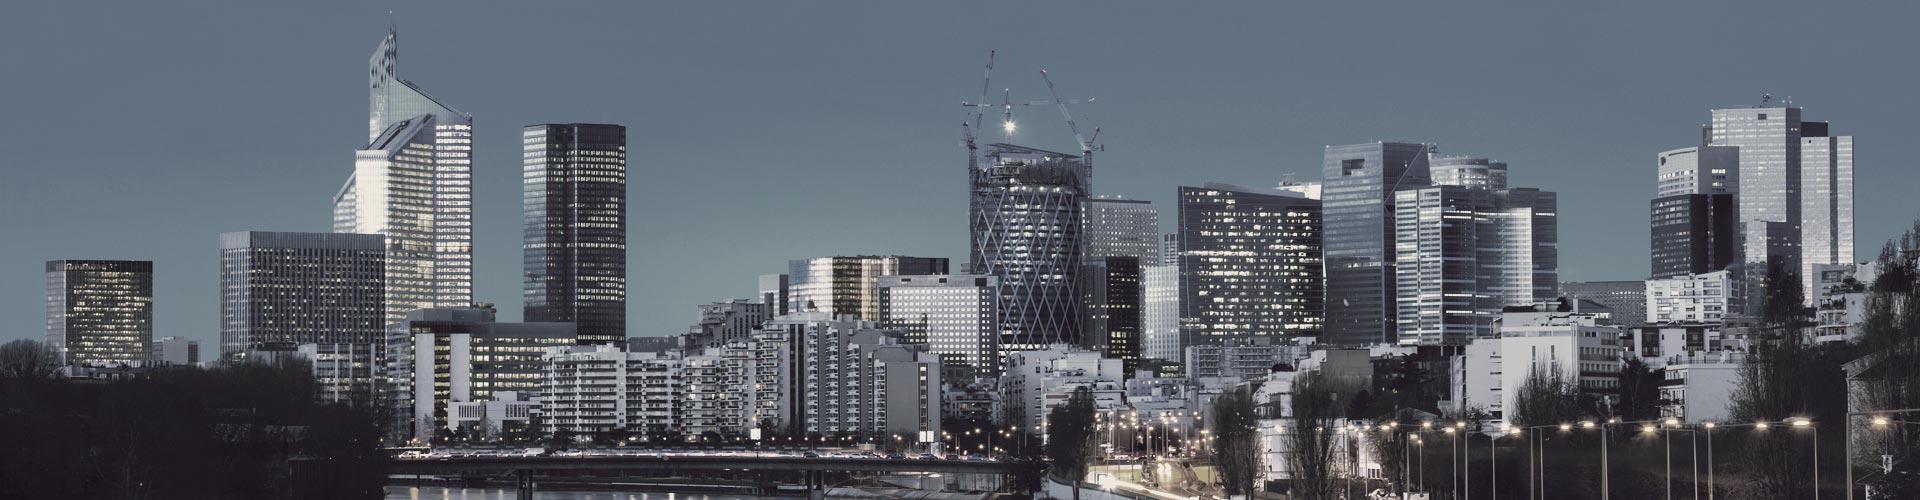 Building_V